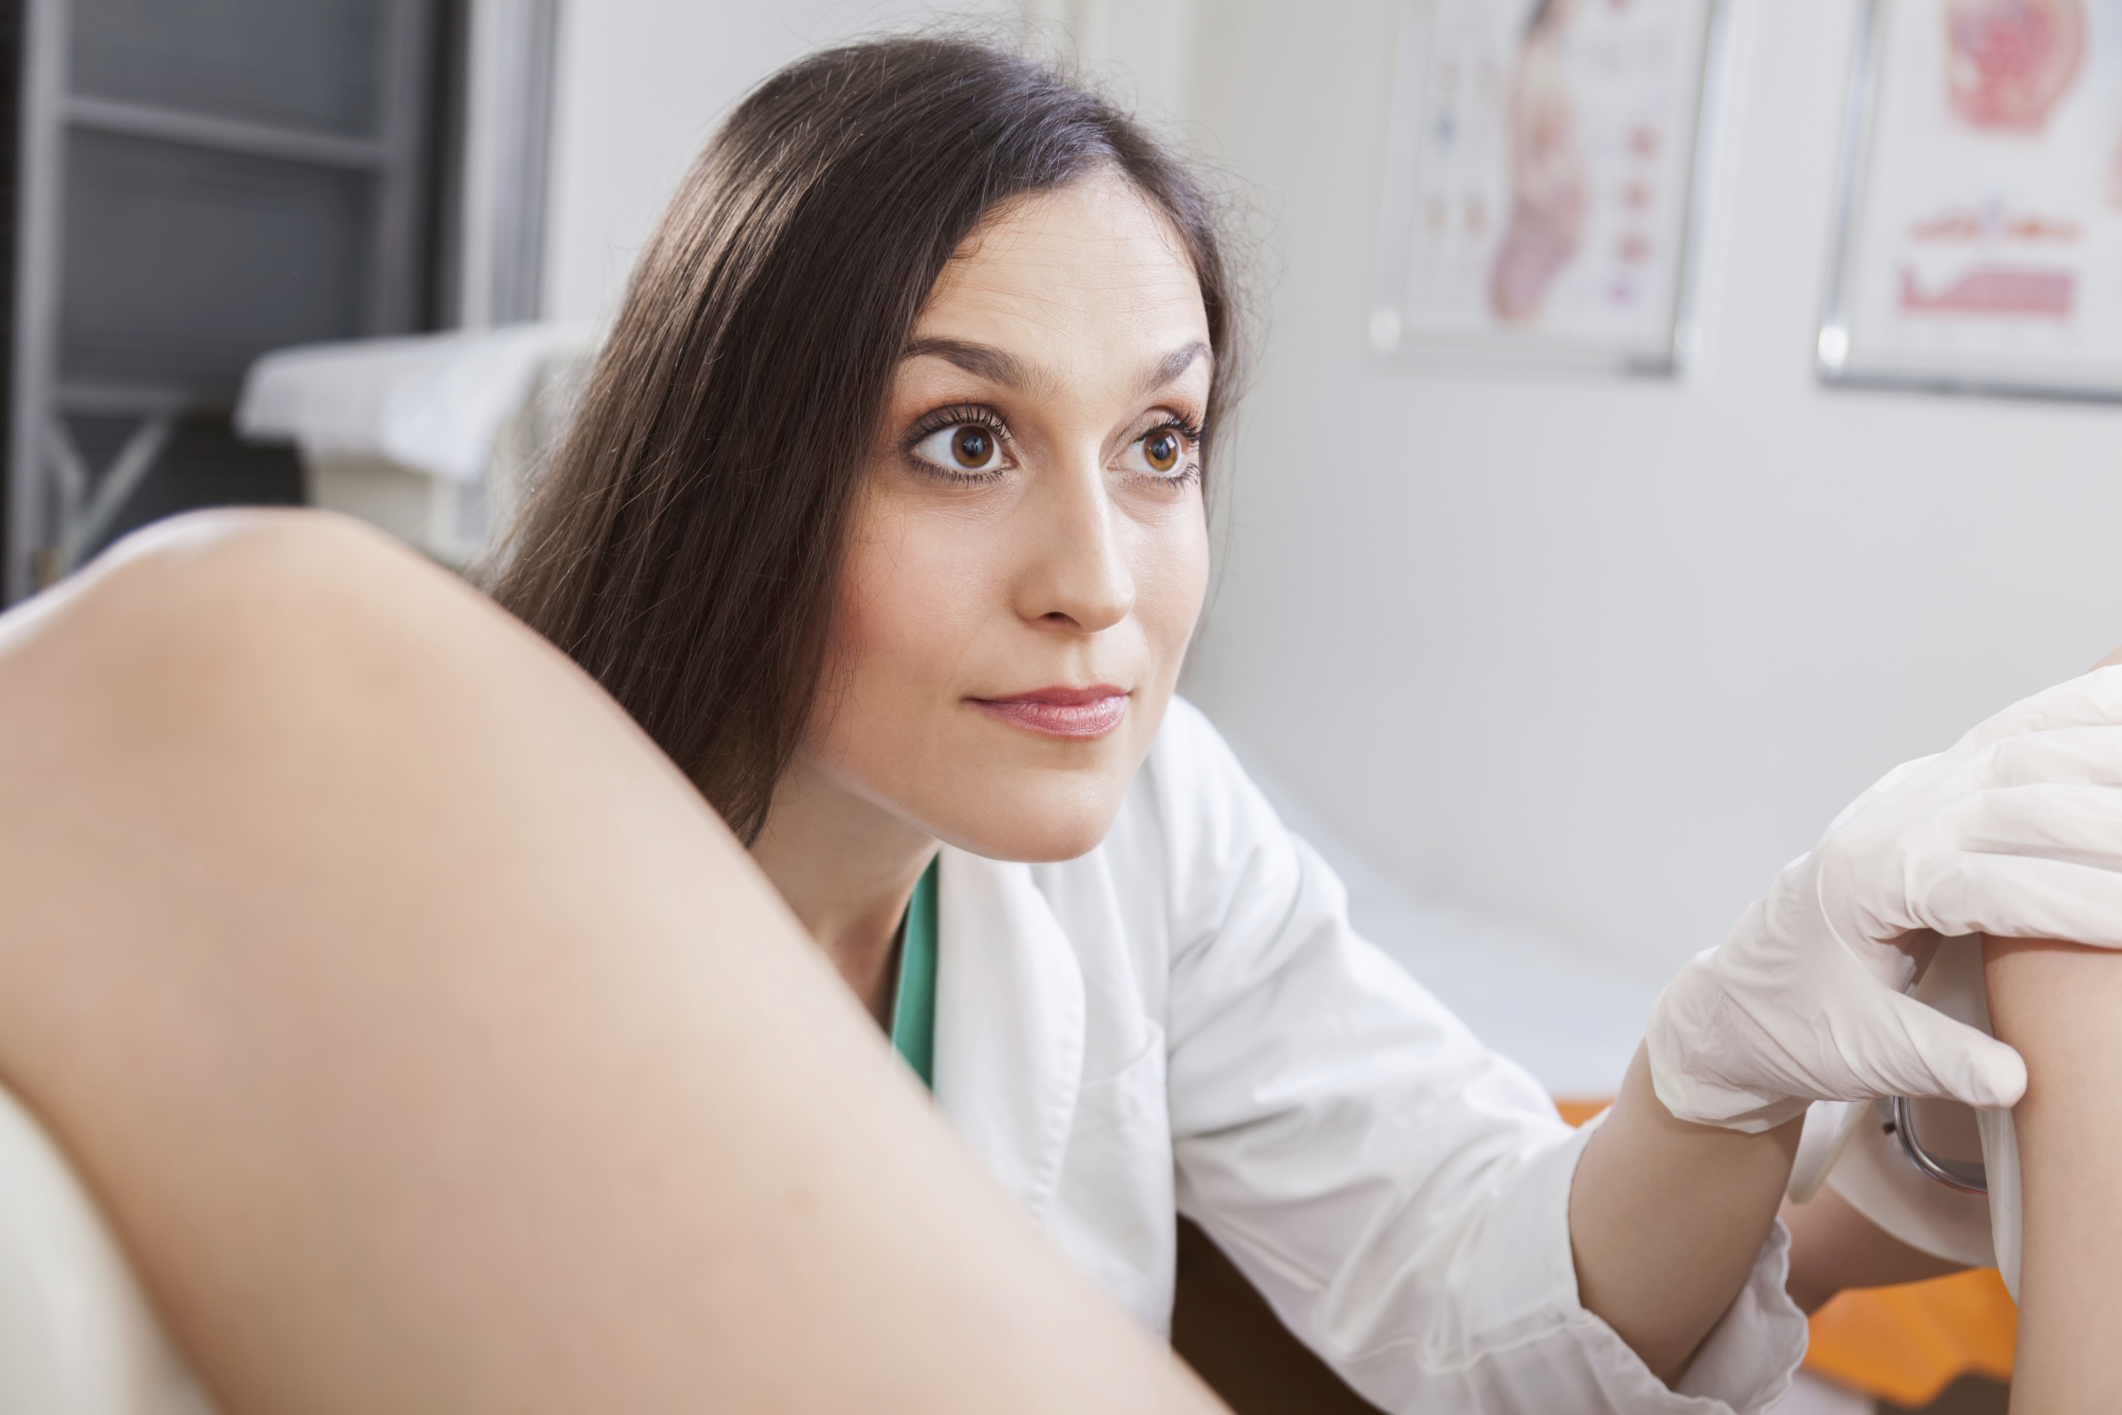 Фото девушка на приёме у гениколога, Голые девушки у врача на приеме - фото голых у врача 25 фотография